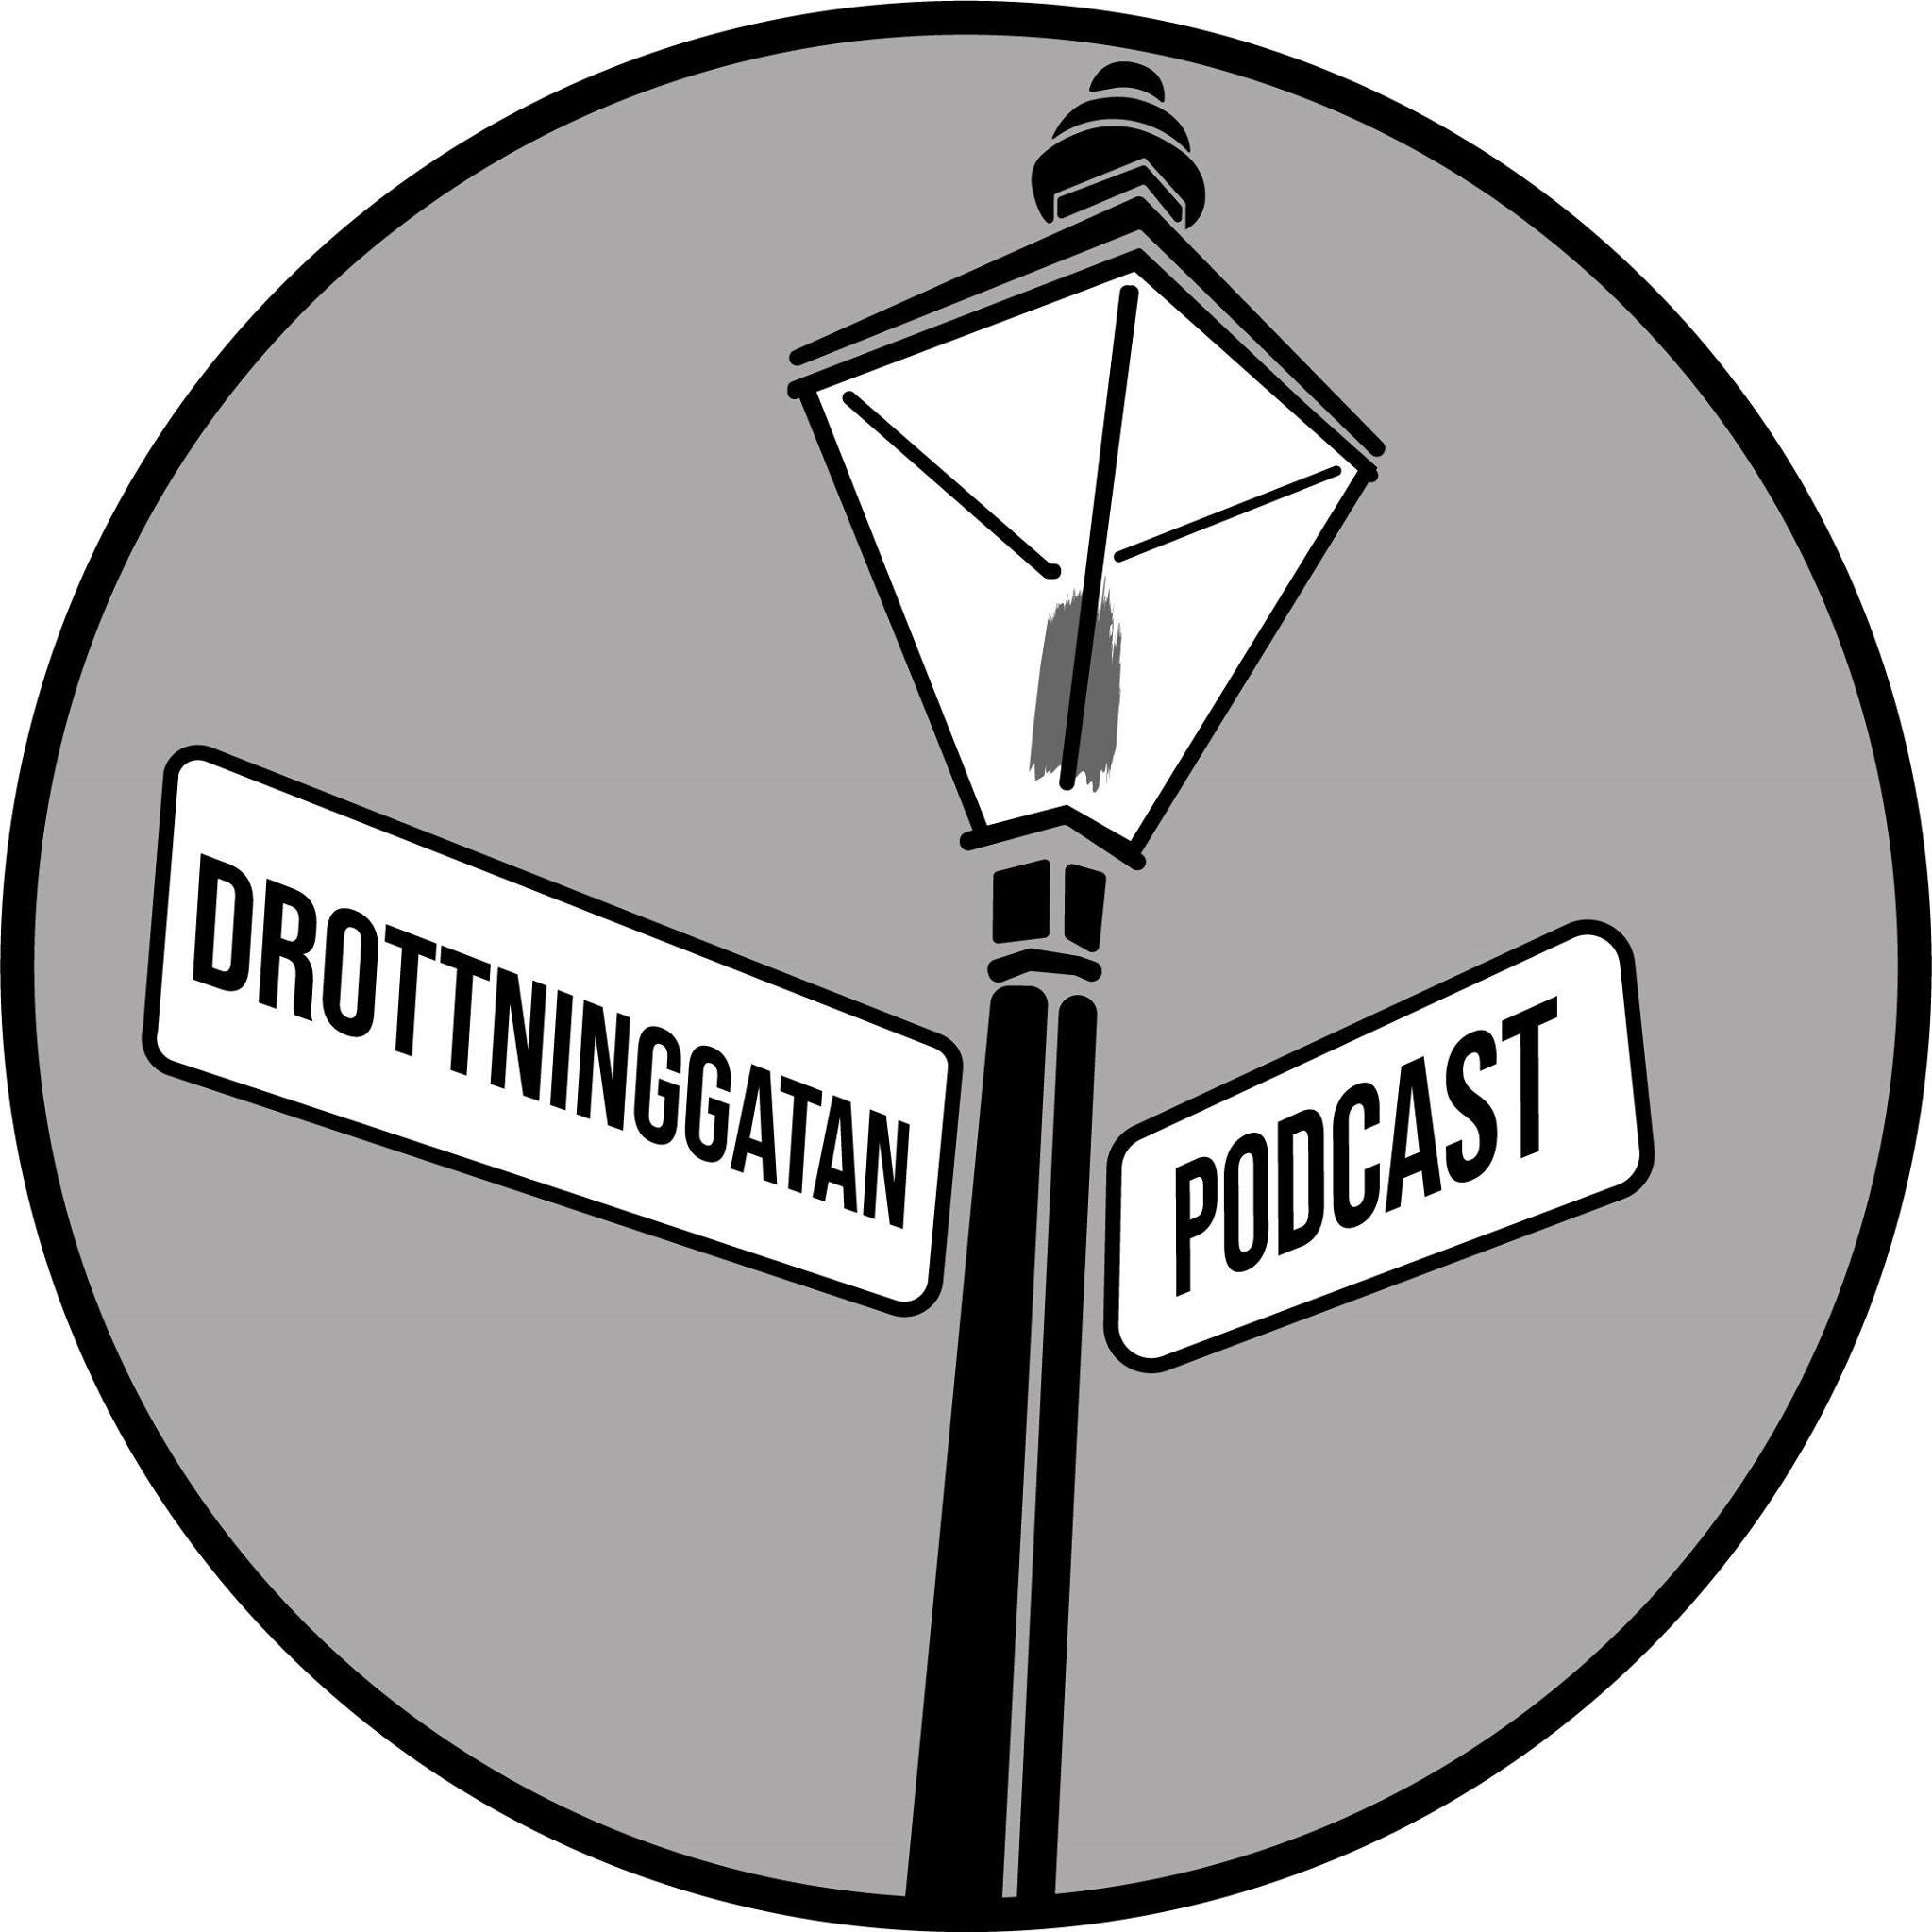 Drottninggatan Podcast